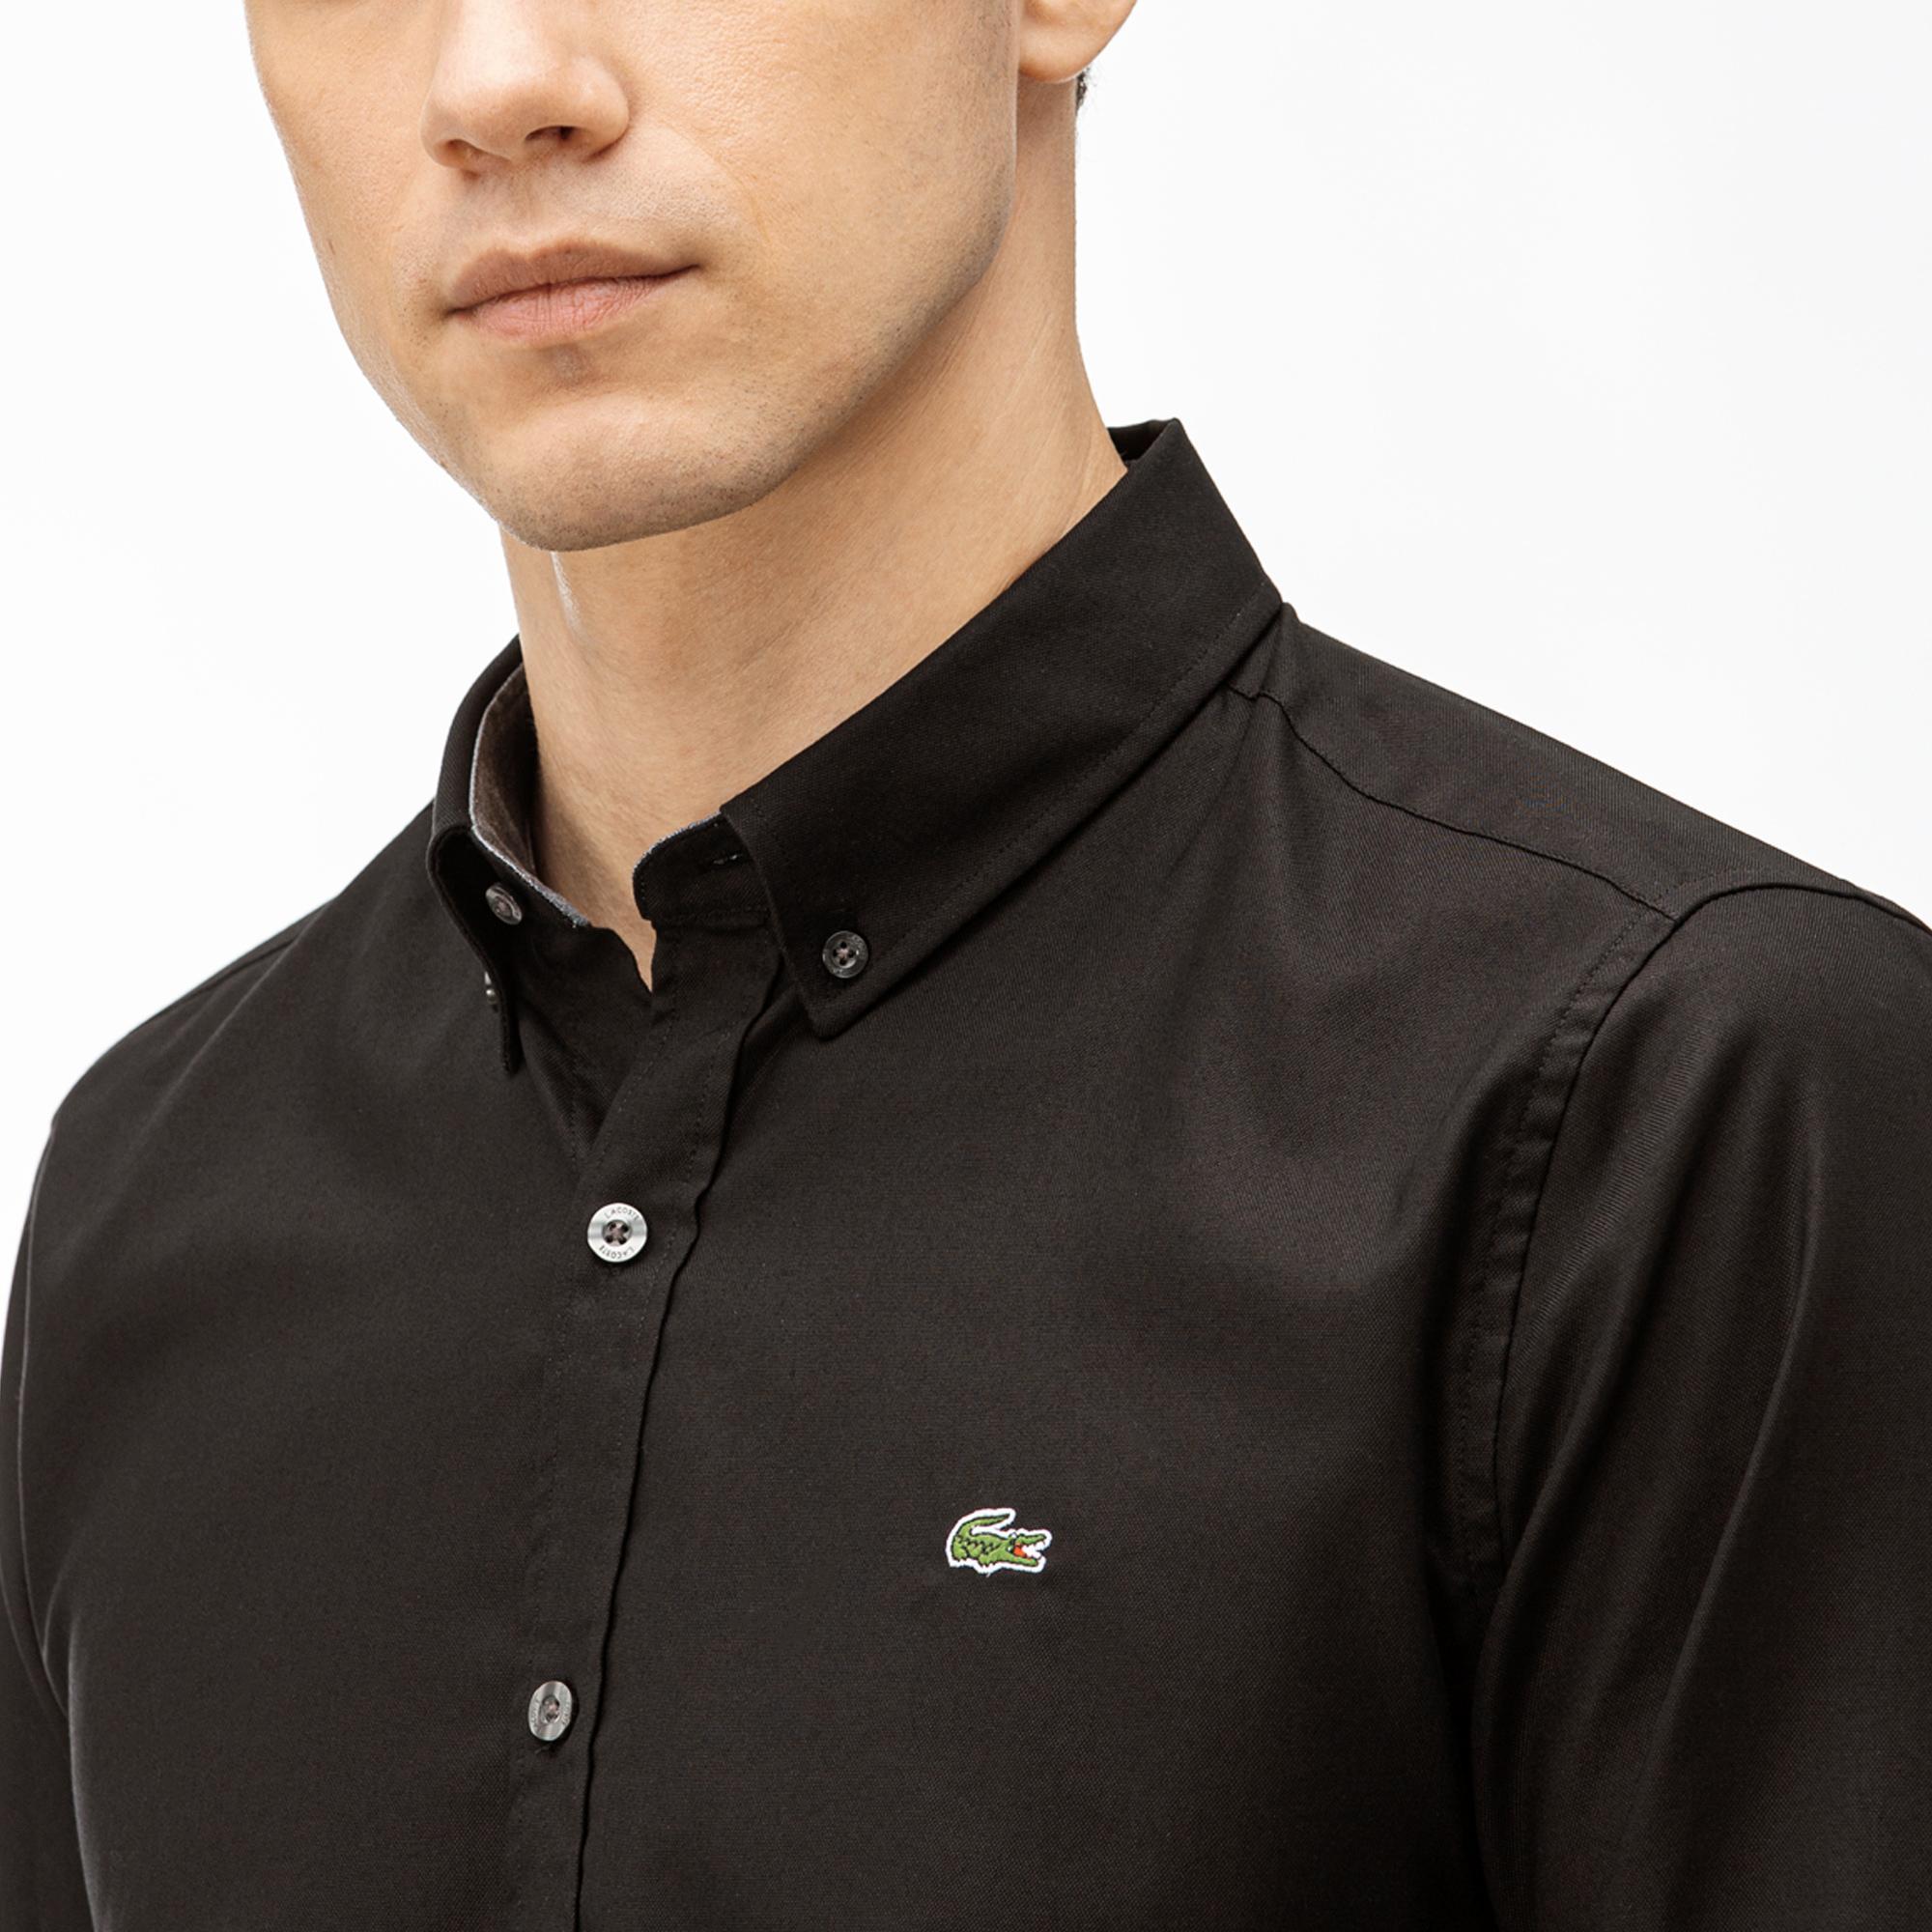 Lacoste Erkek Slim Fit Siyah Gömlek